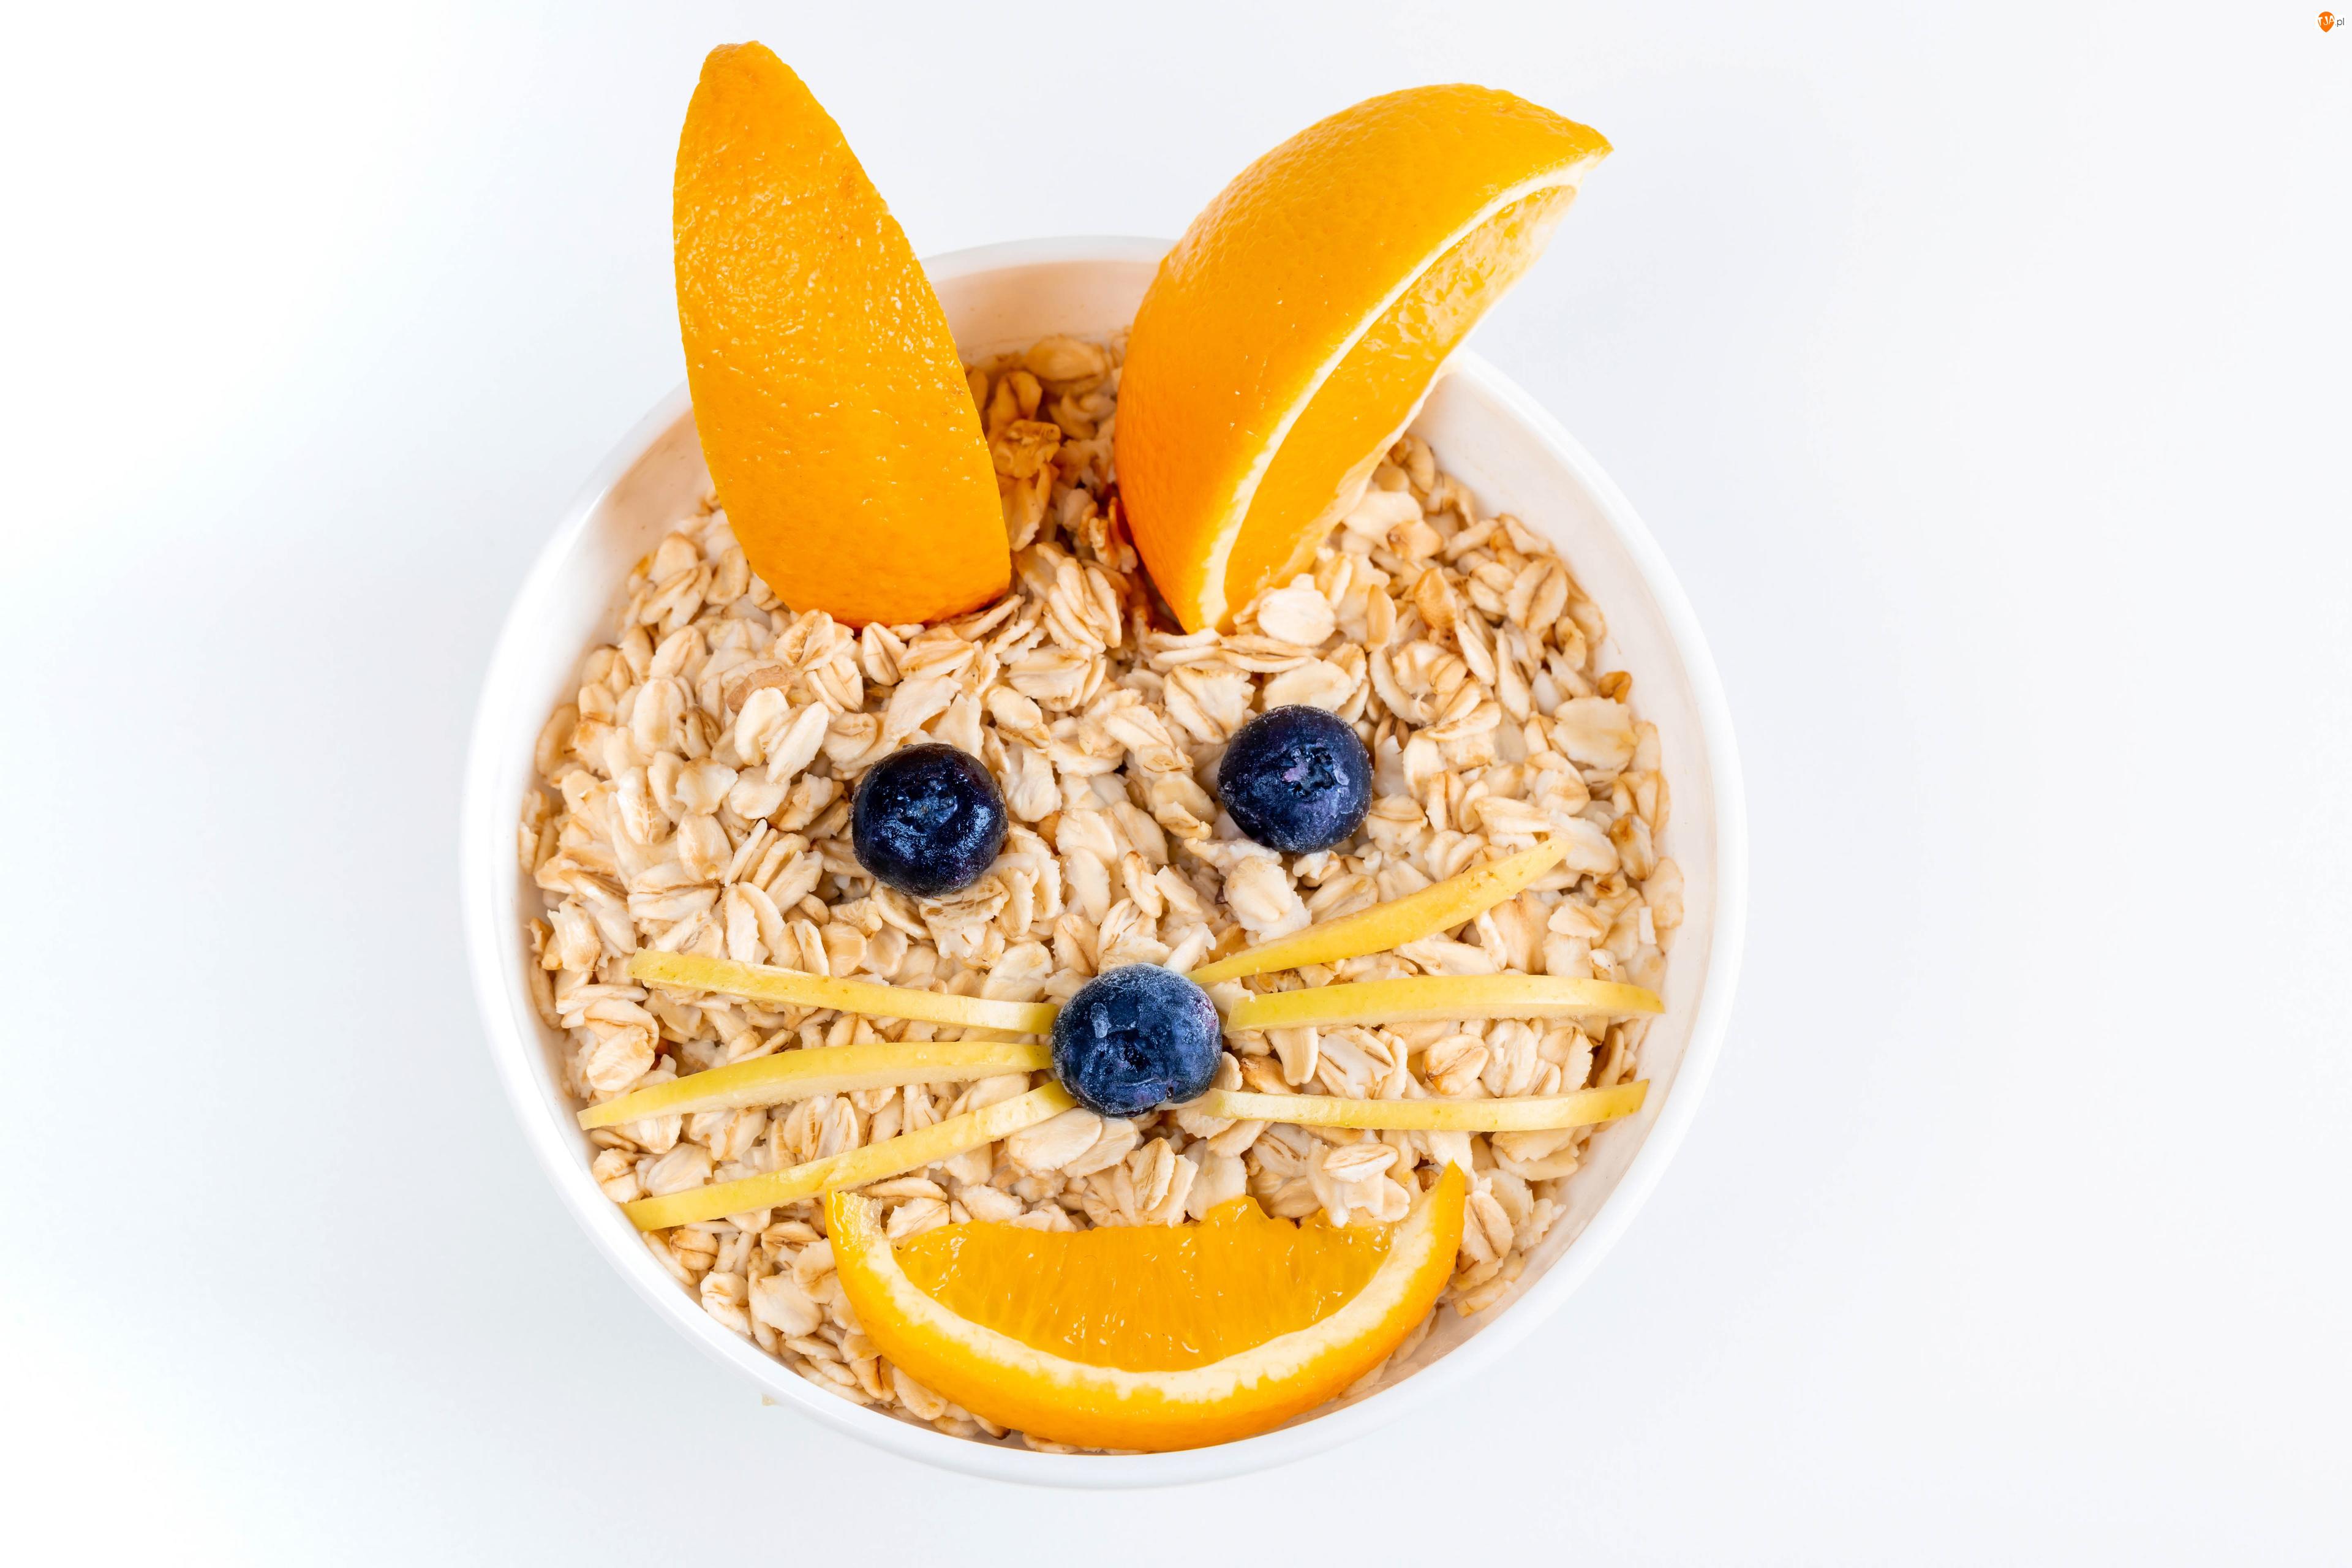 Jagody, Musli, Miska, Śniadanie, Pomarańcze, Kot